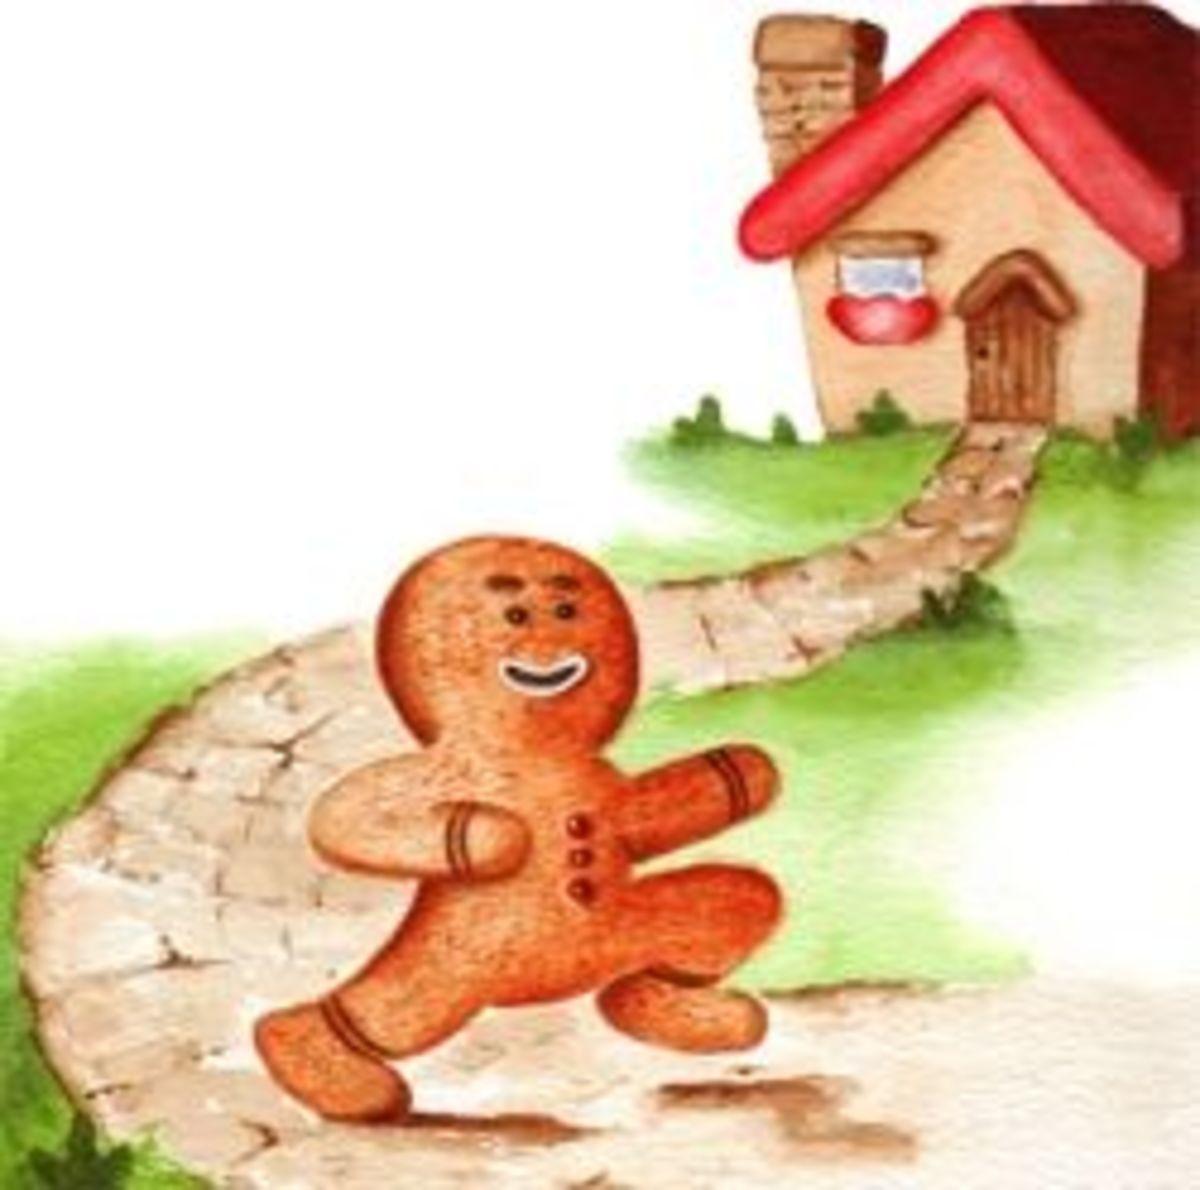 Gingerbread Man Image Credit: http://playgroupsandplaydates.blogspot.com/2010/11/gingerbread-man-playdate.html